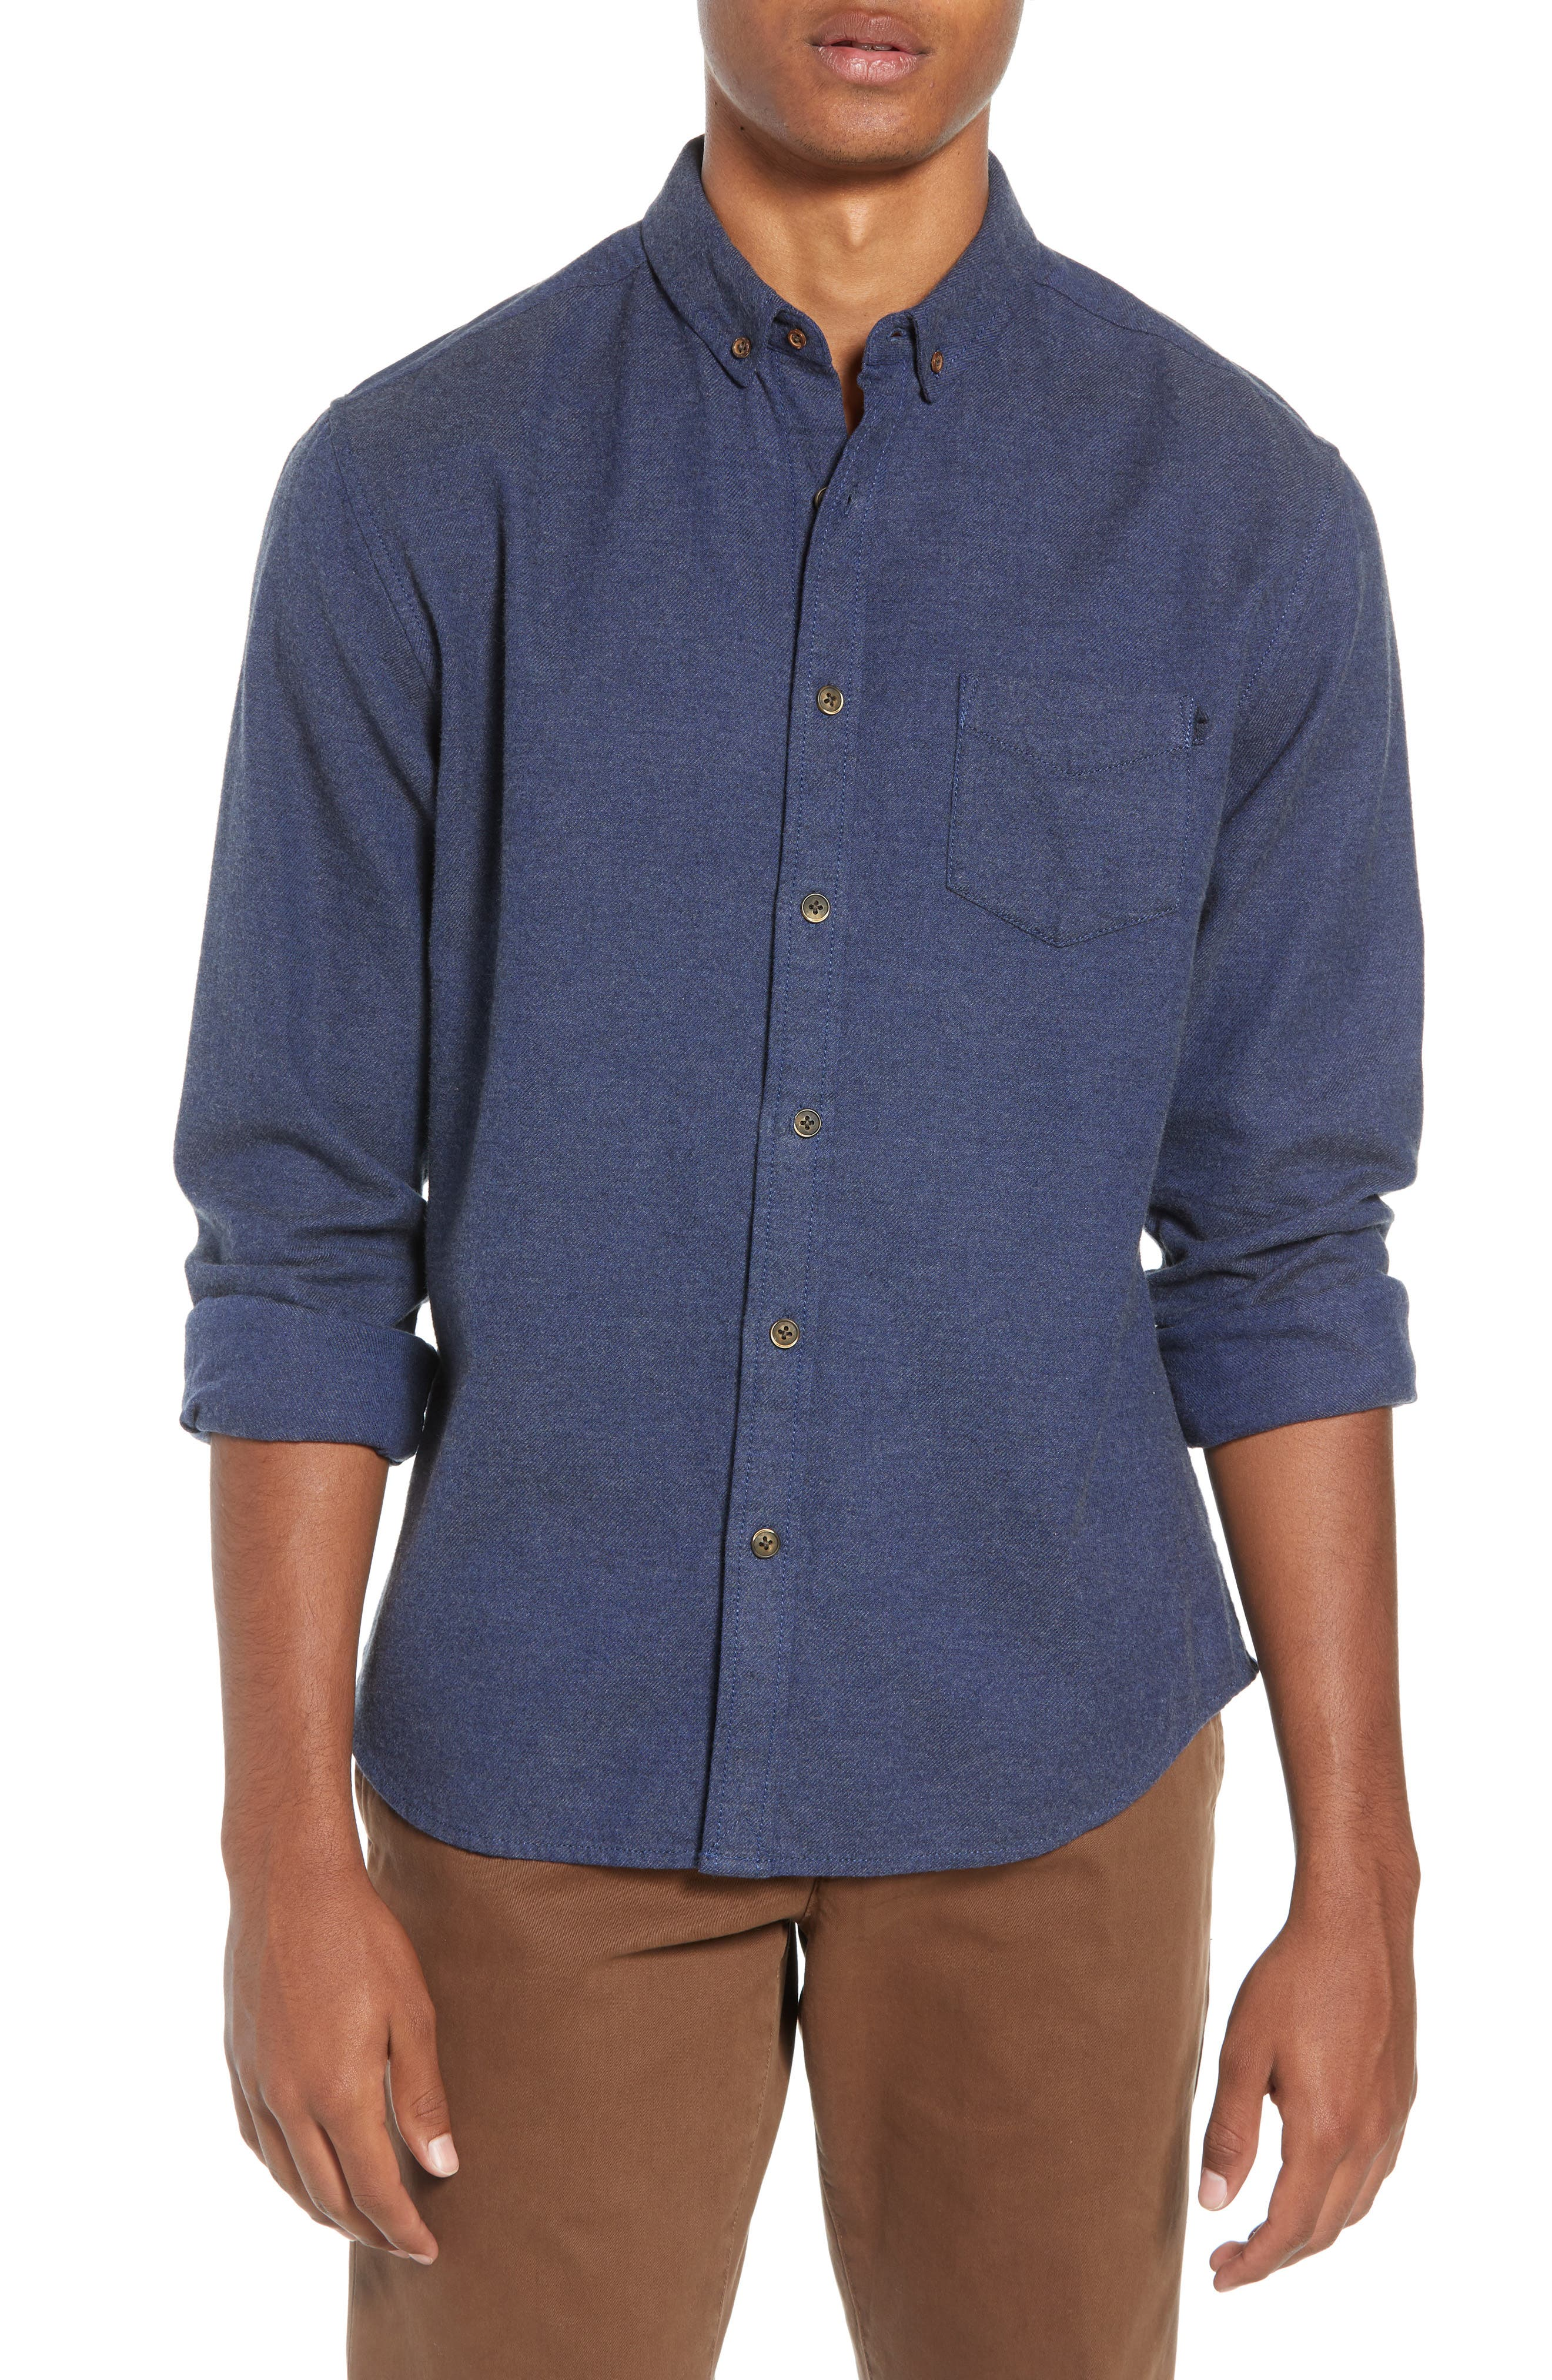 LIFE/AFTER/DENIM Greenpoint Regular Fit Sport Shirt, Main, color, 400